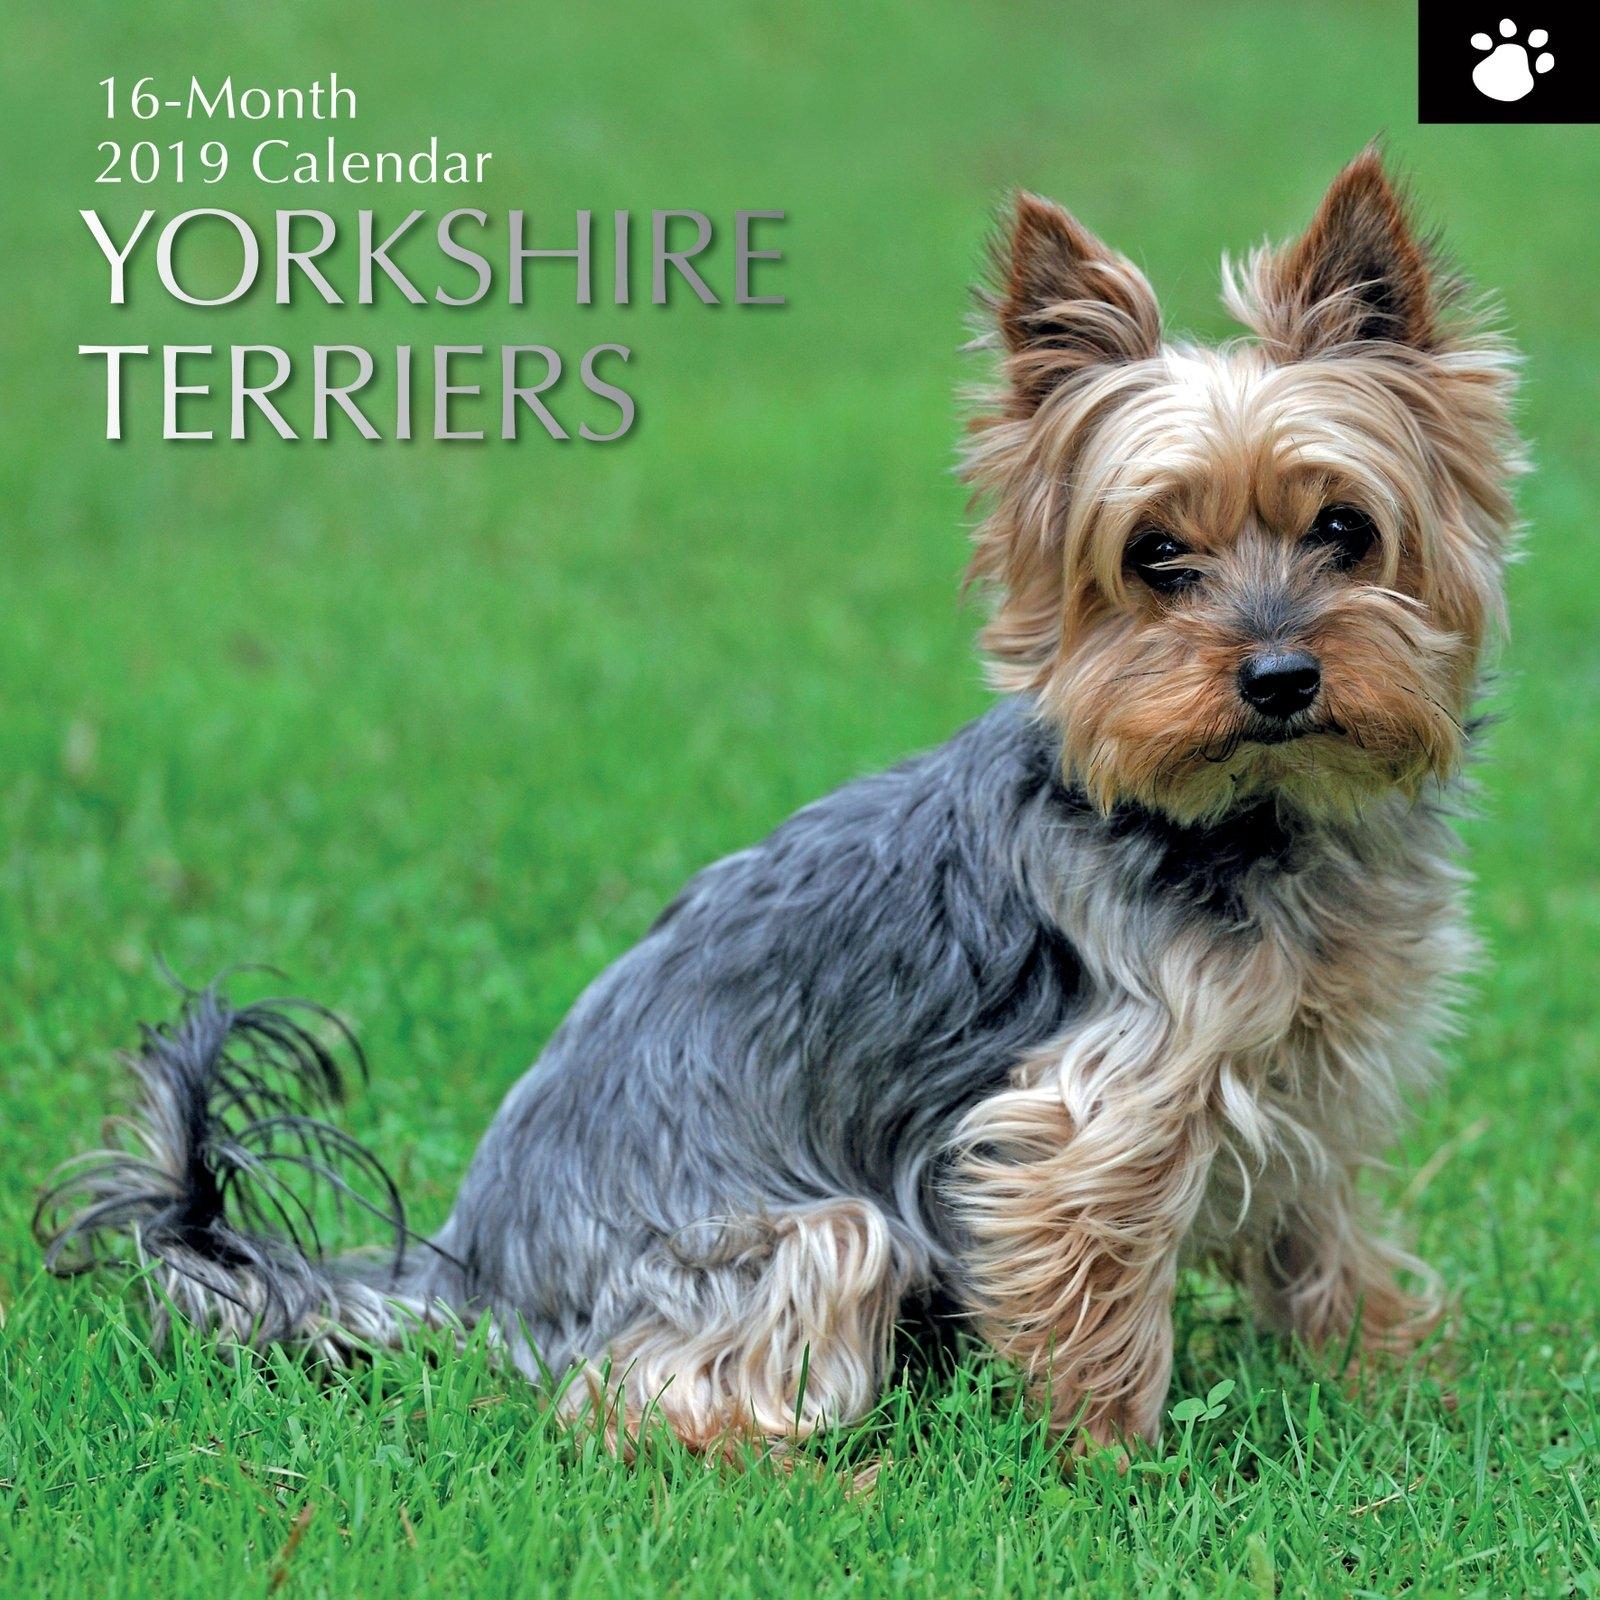 Yorkshire Terriers – 2019 Wall Calendar 16 Month Premium Square Calendar 2019 Yorkshire